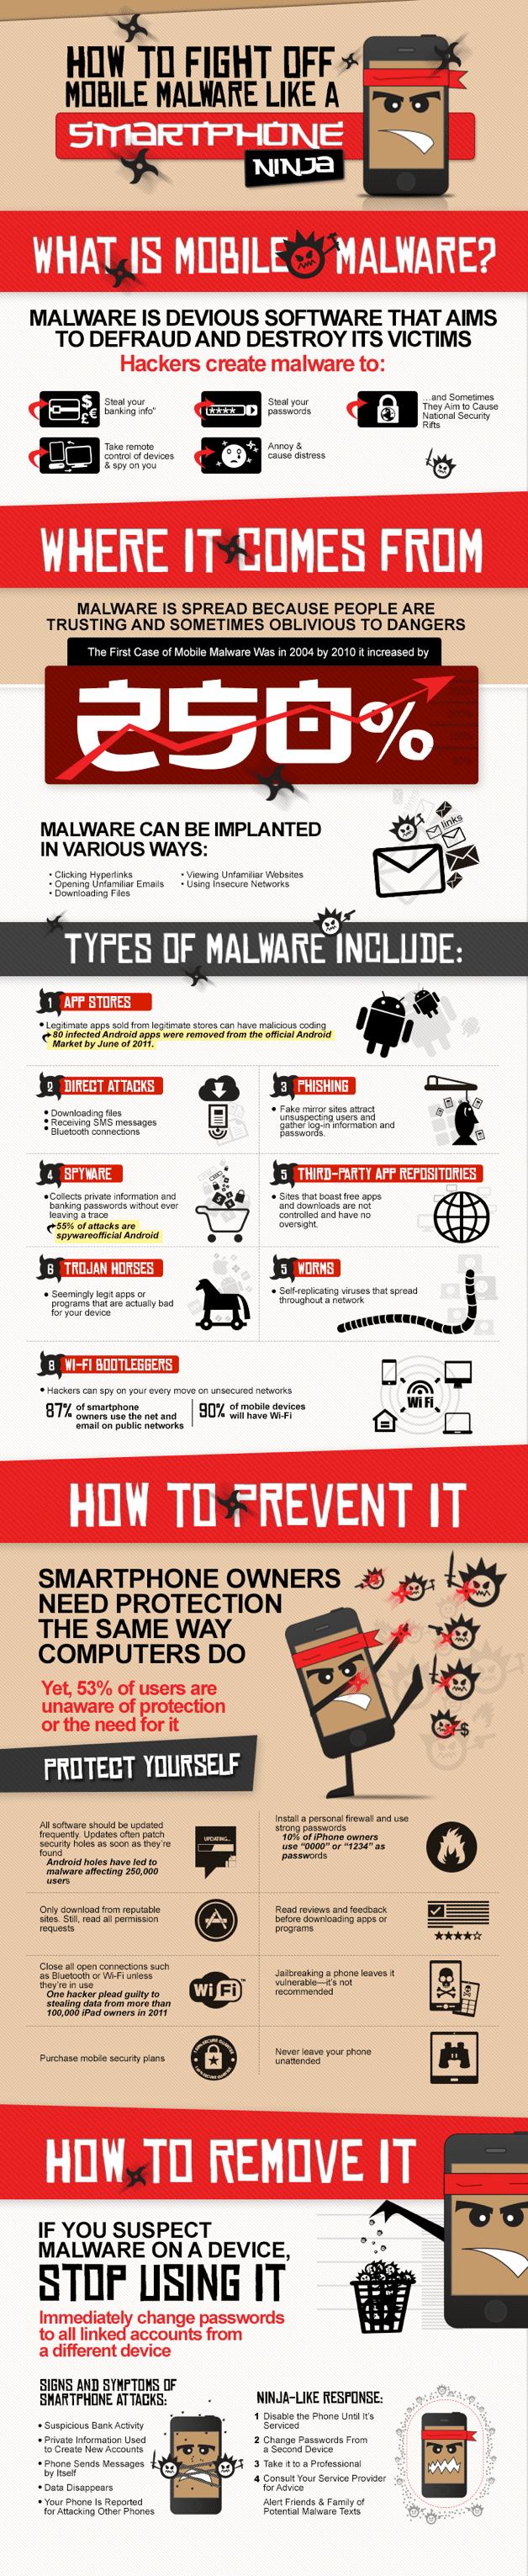 Mobile Ninja Tactics To Fight Off Mobile Malware [Infographic]